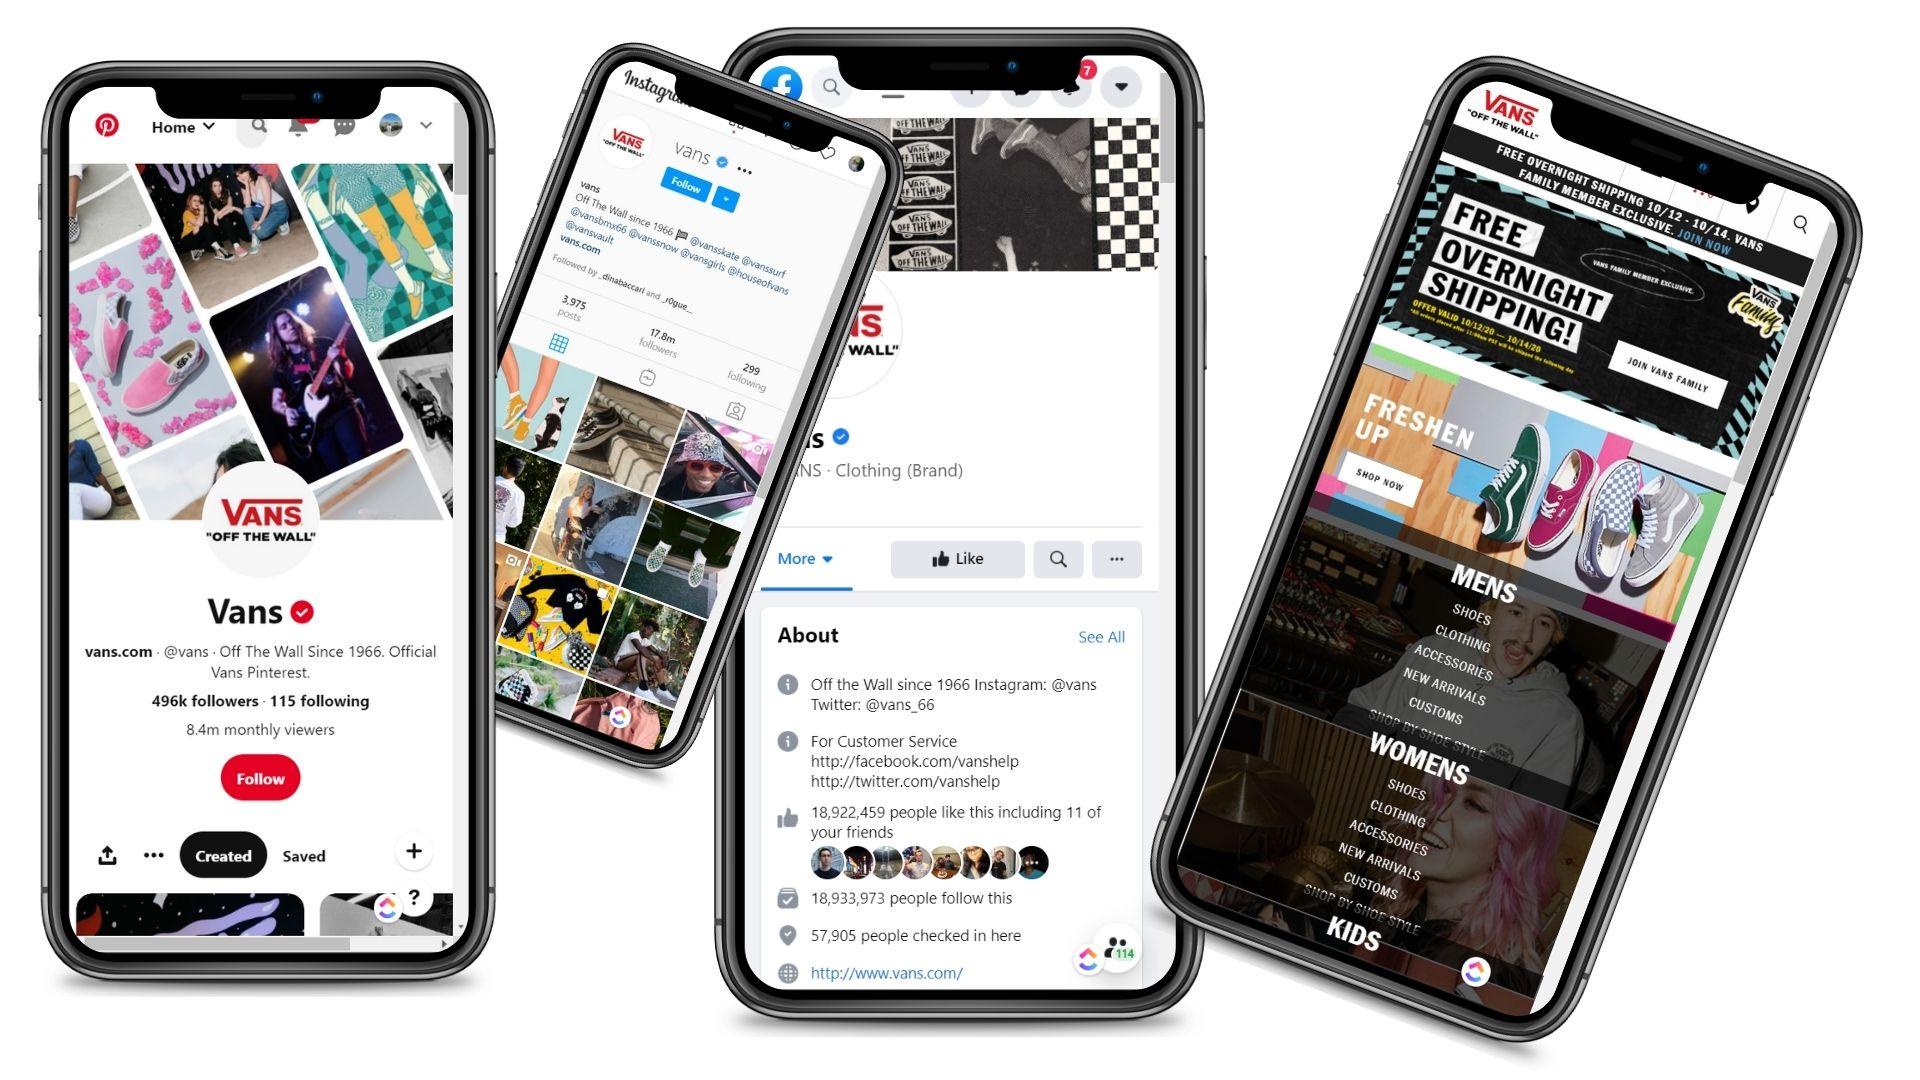 Vans Social Media Pop Up Event Mobile Responsiveness